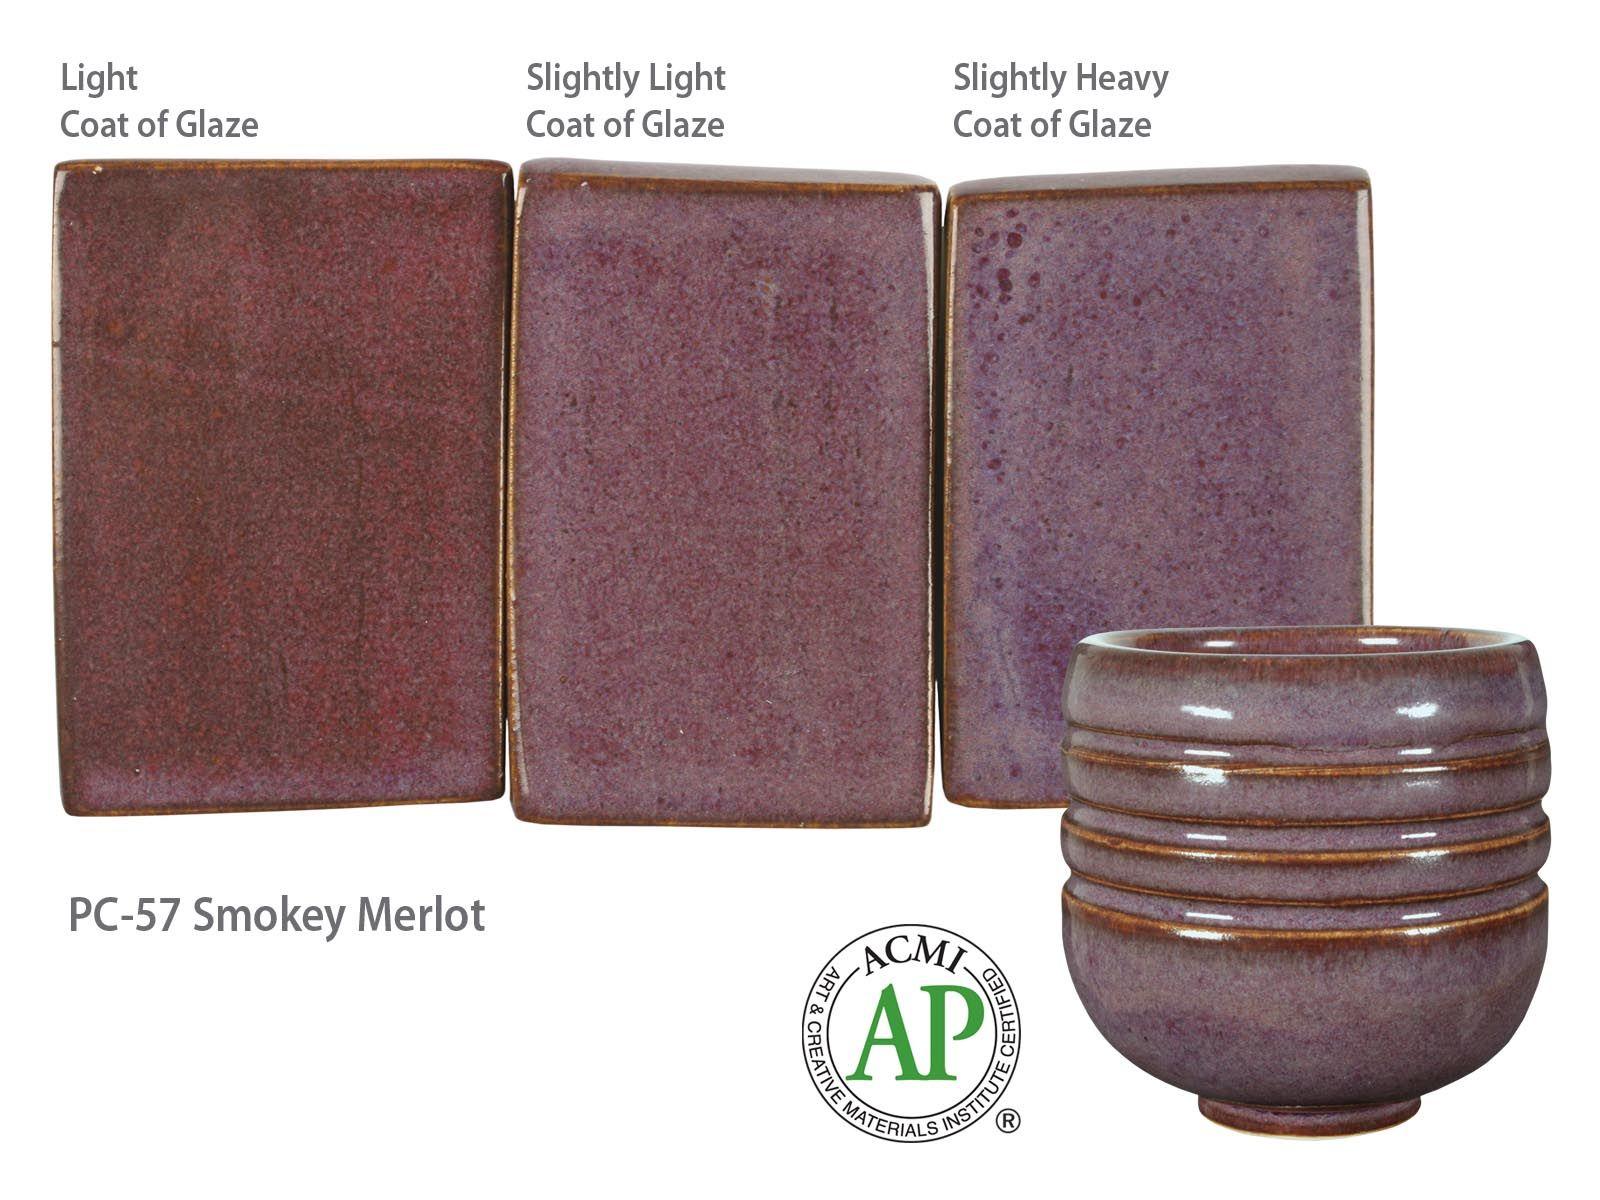 Smokey Merlot Pc-57 AMACO Potters Choice Lead-Free Non-Toxic Glaze